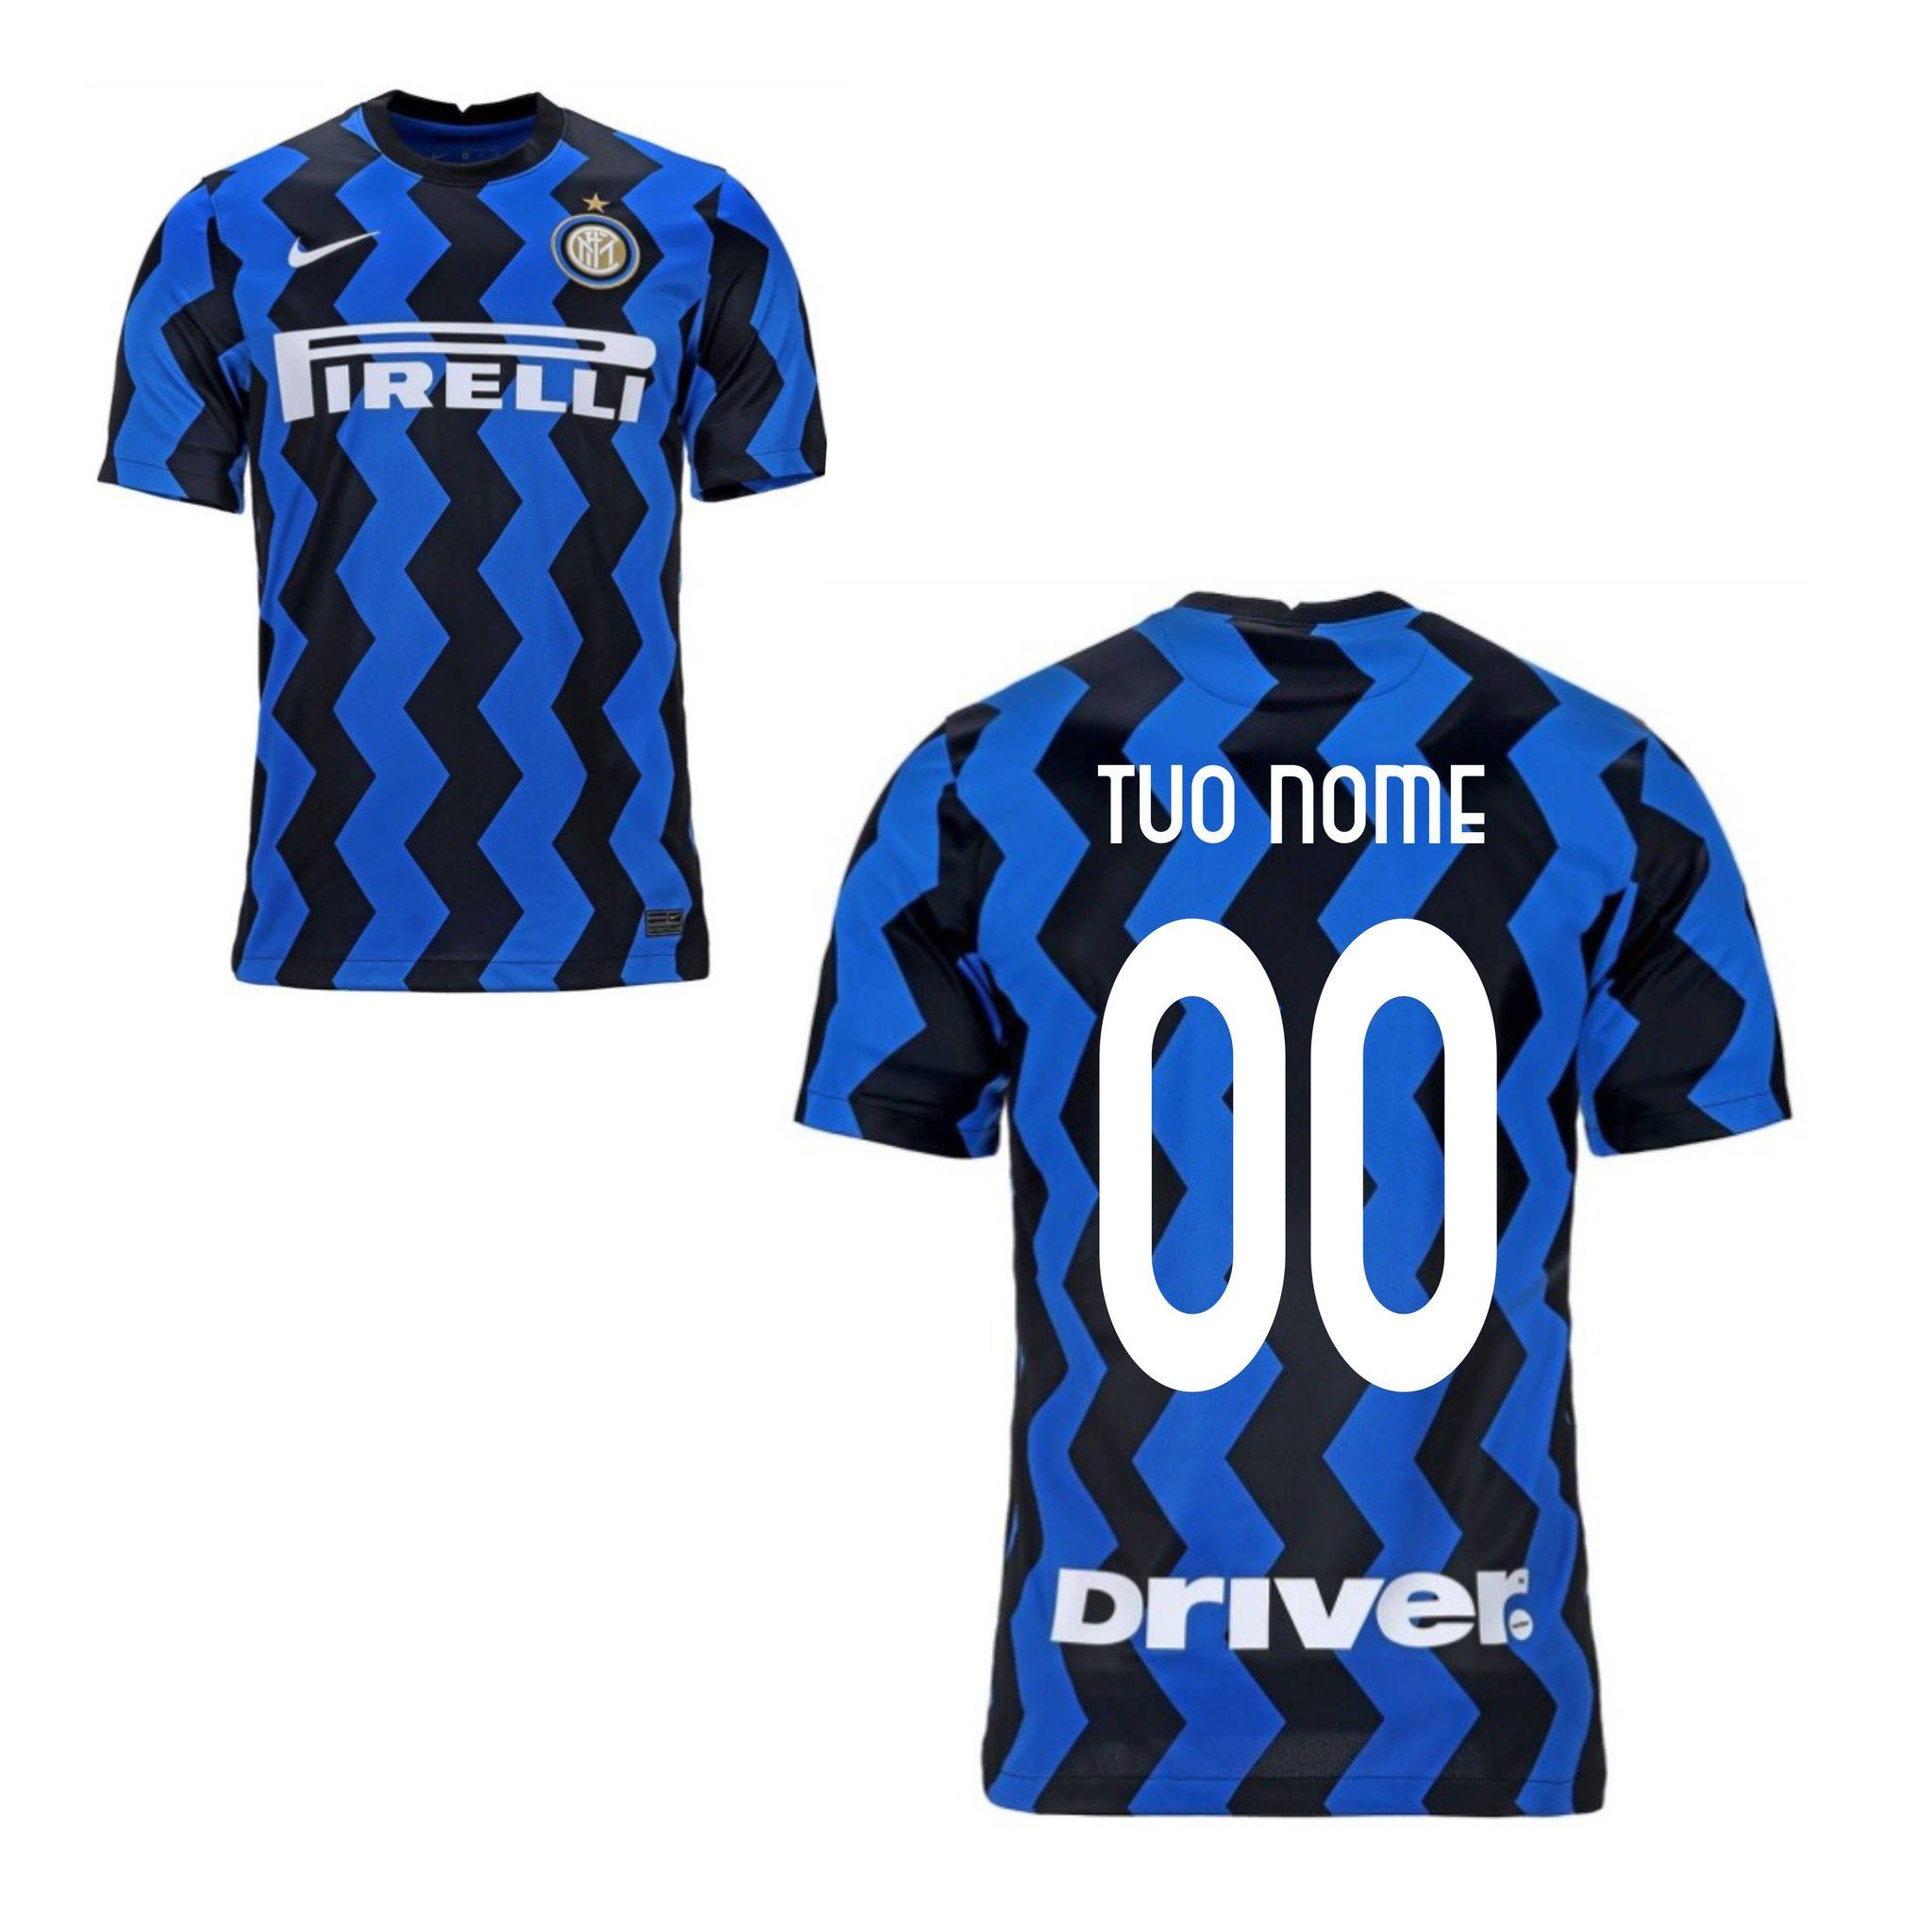 Maglia Gara Home F.C. Inter 2020/2021